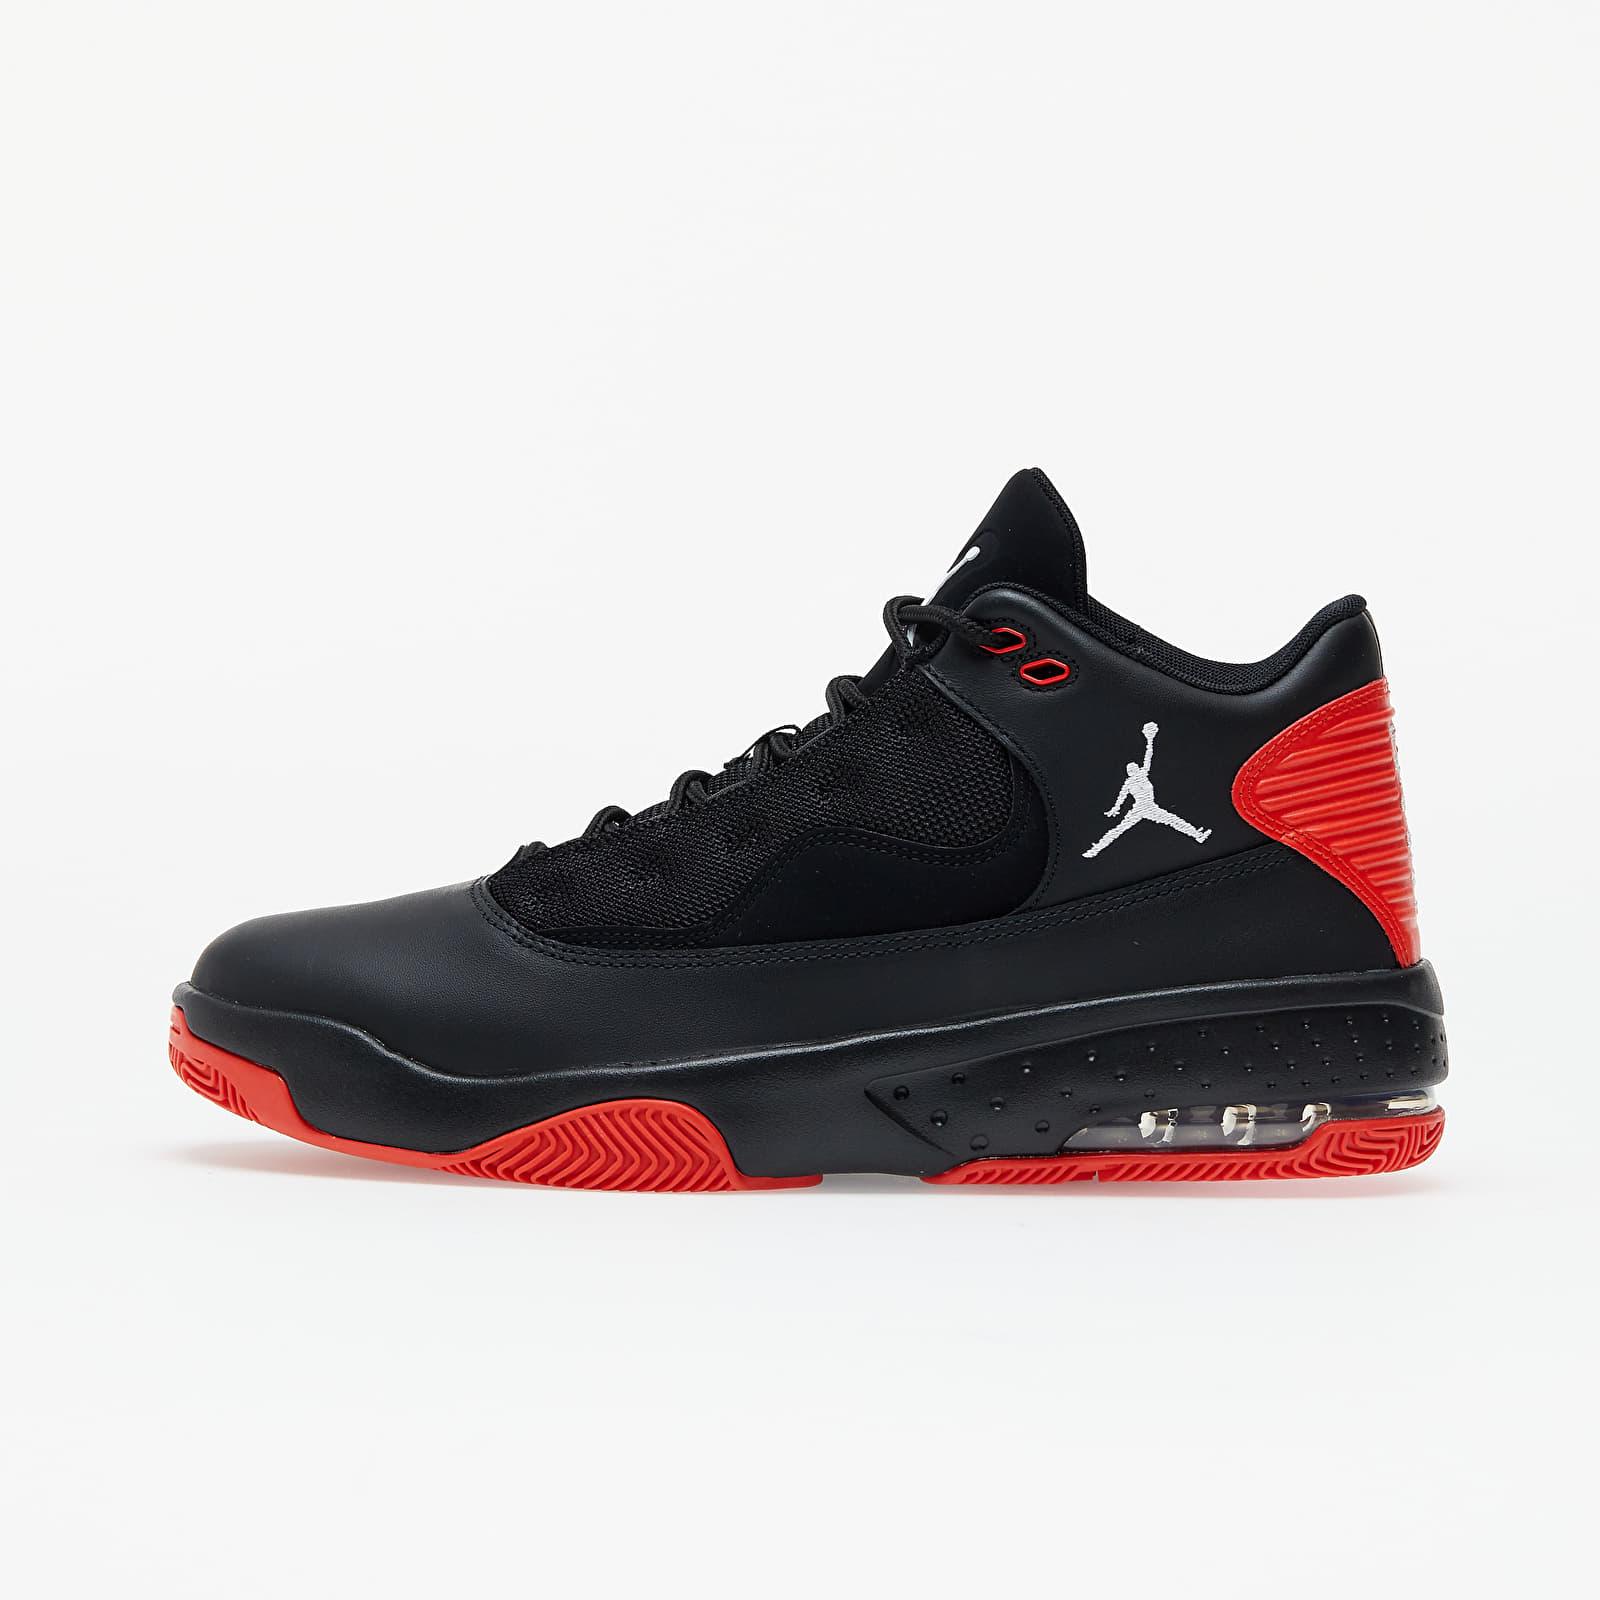 Jordan Max Aura 2 Black/ White-Chile Red EUR 44.5